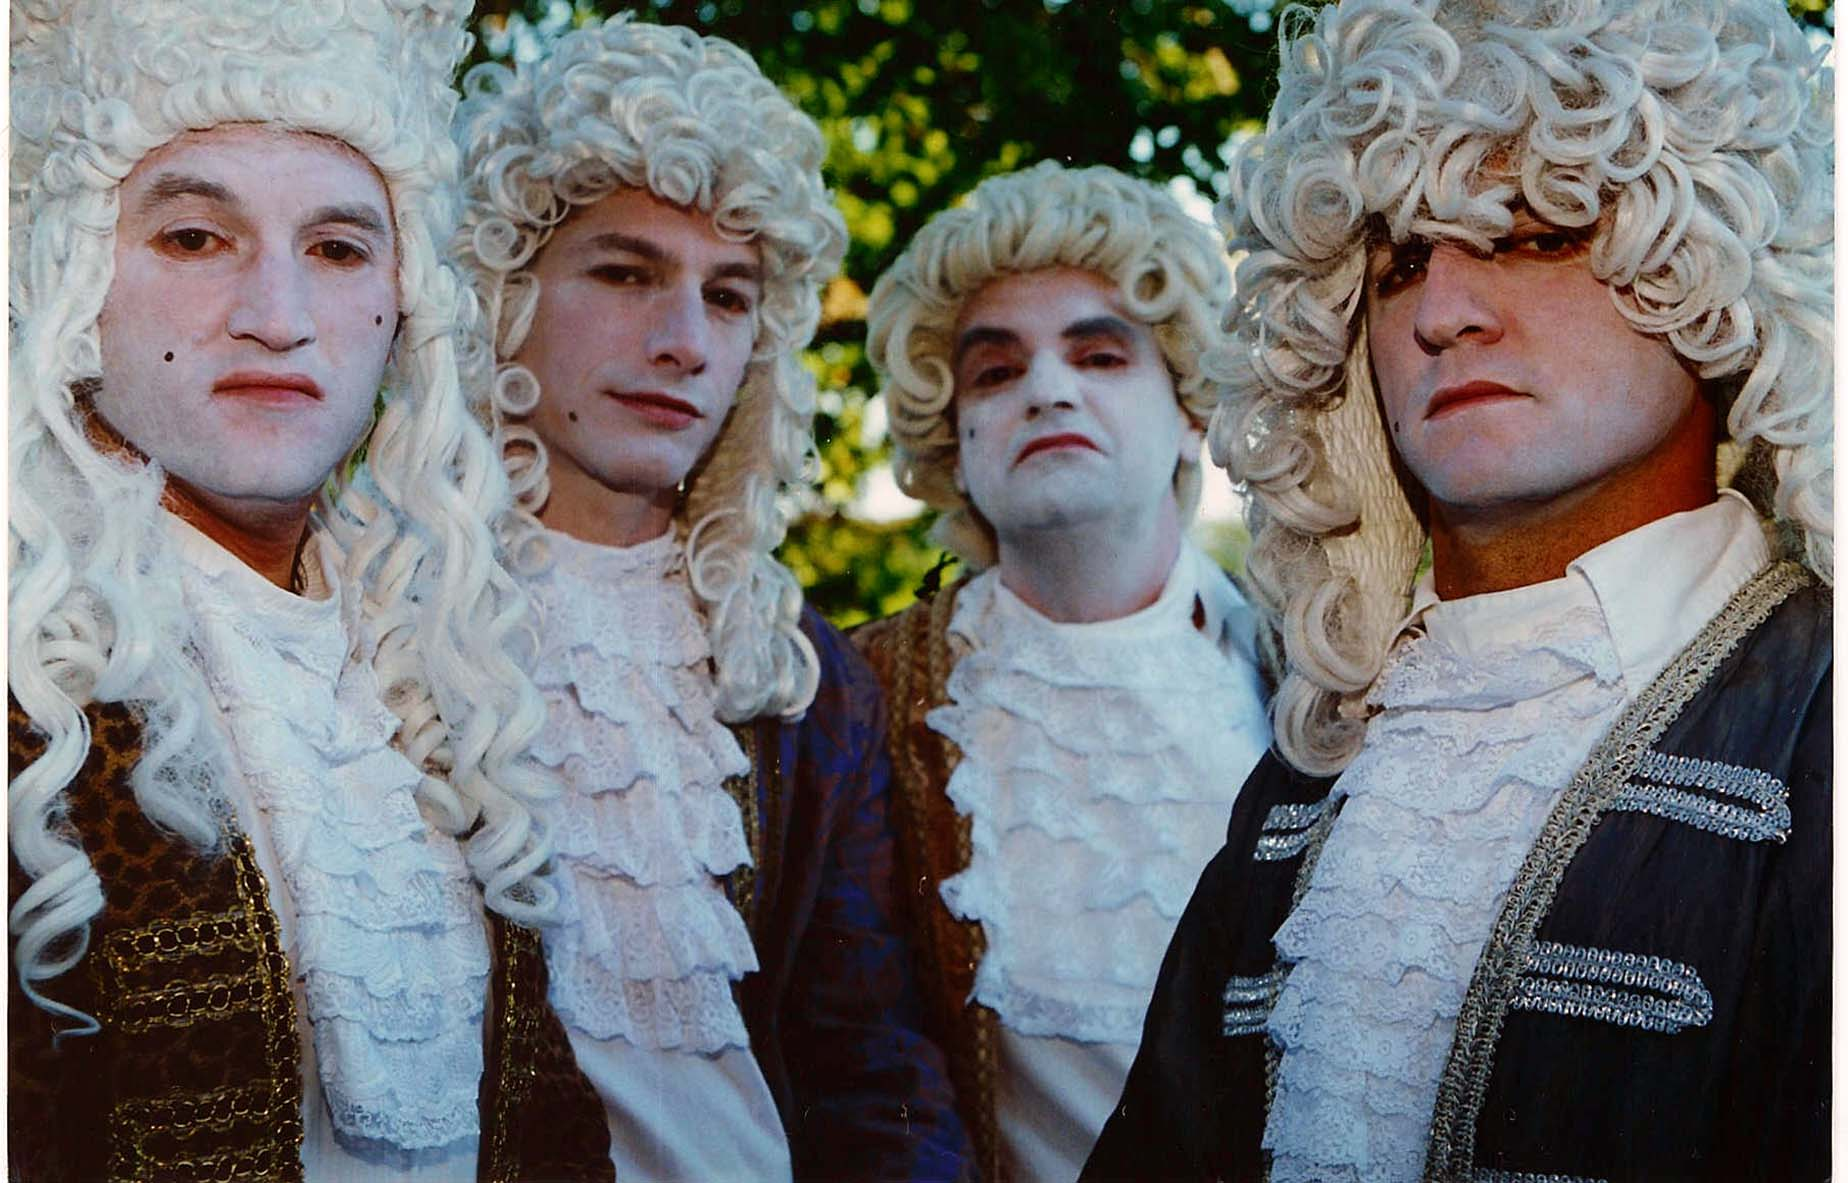 Men in Powdered Wigs 1700s